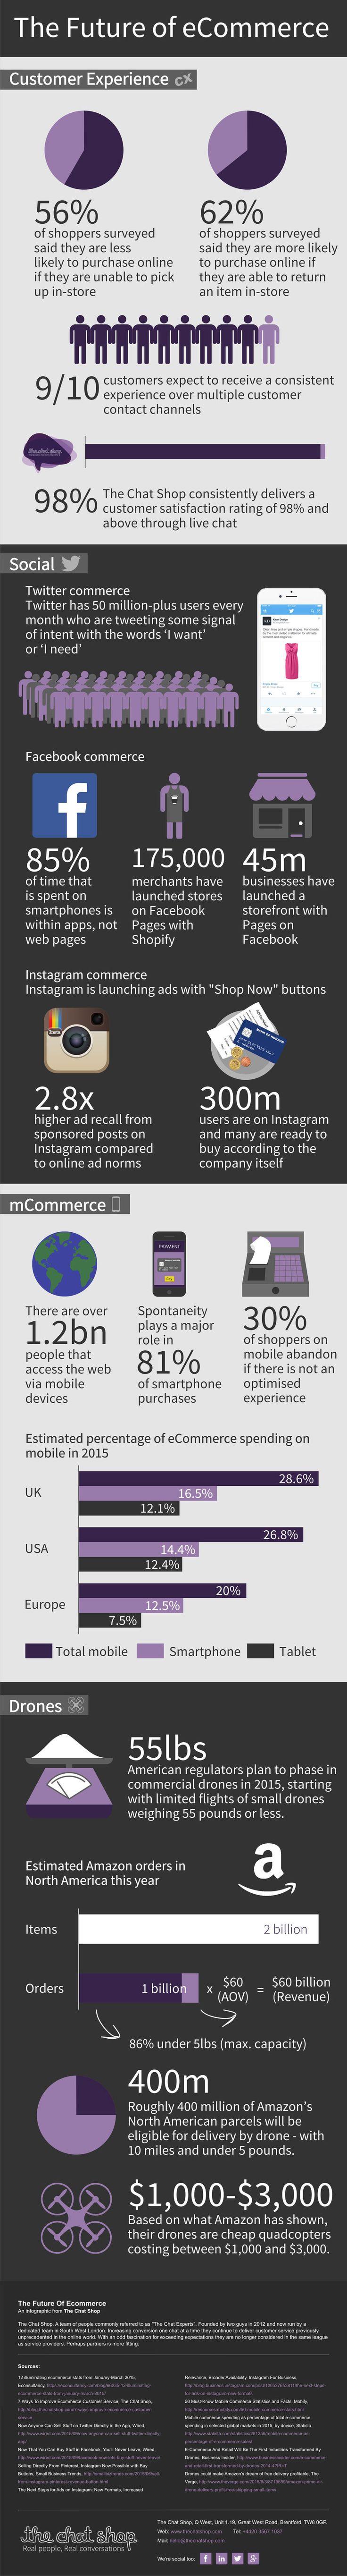 The Future of eCommerce #infographic #Ecommece #Marketing